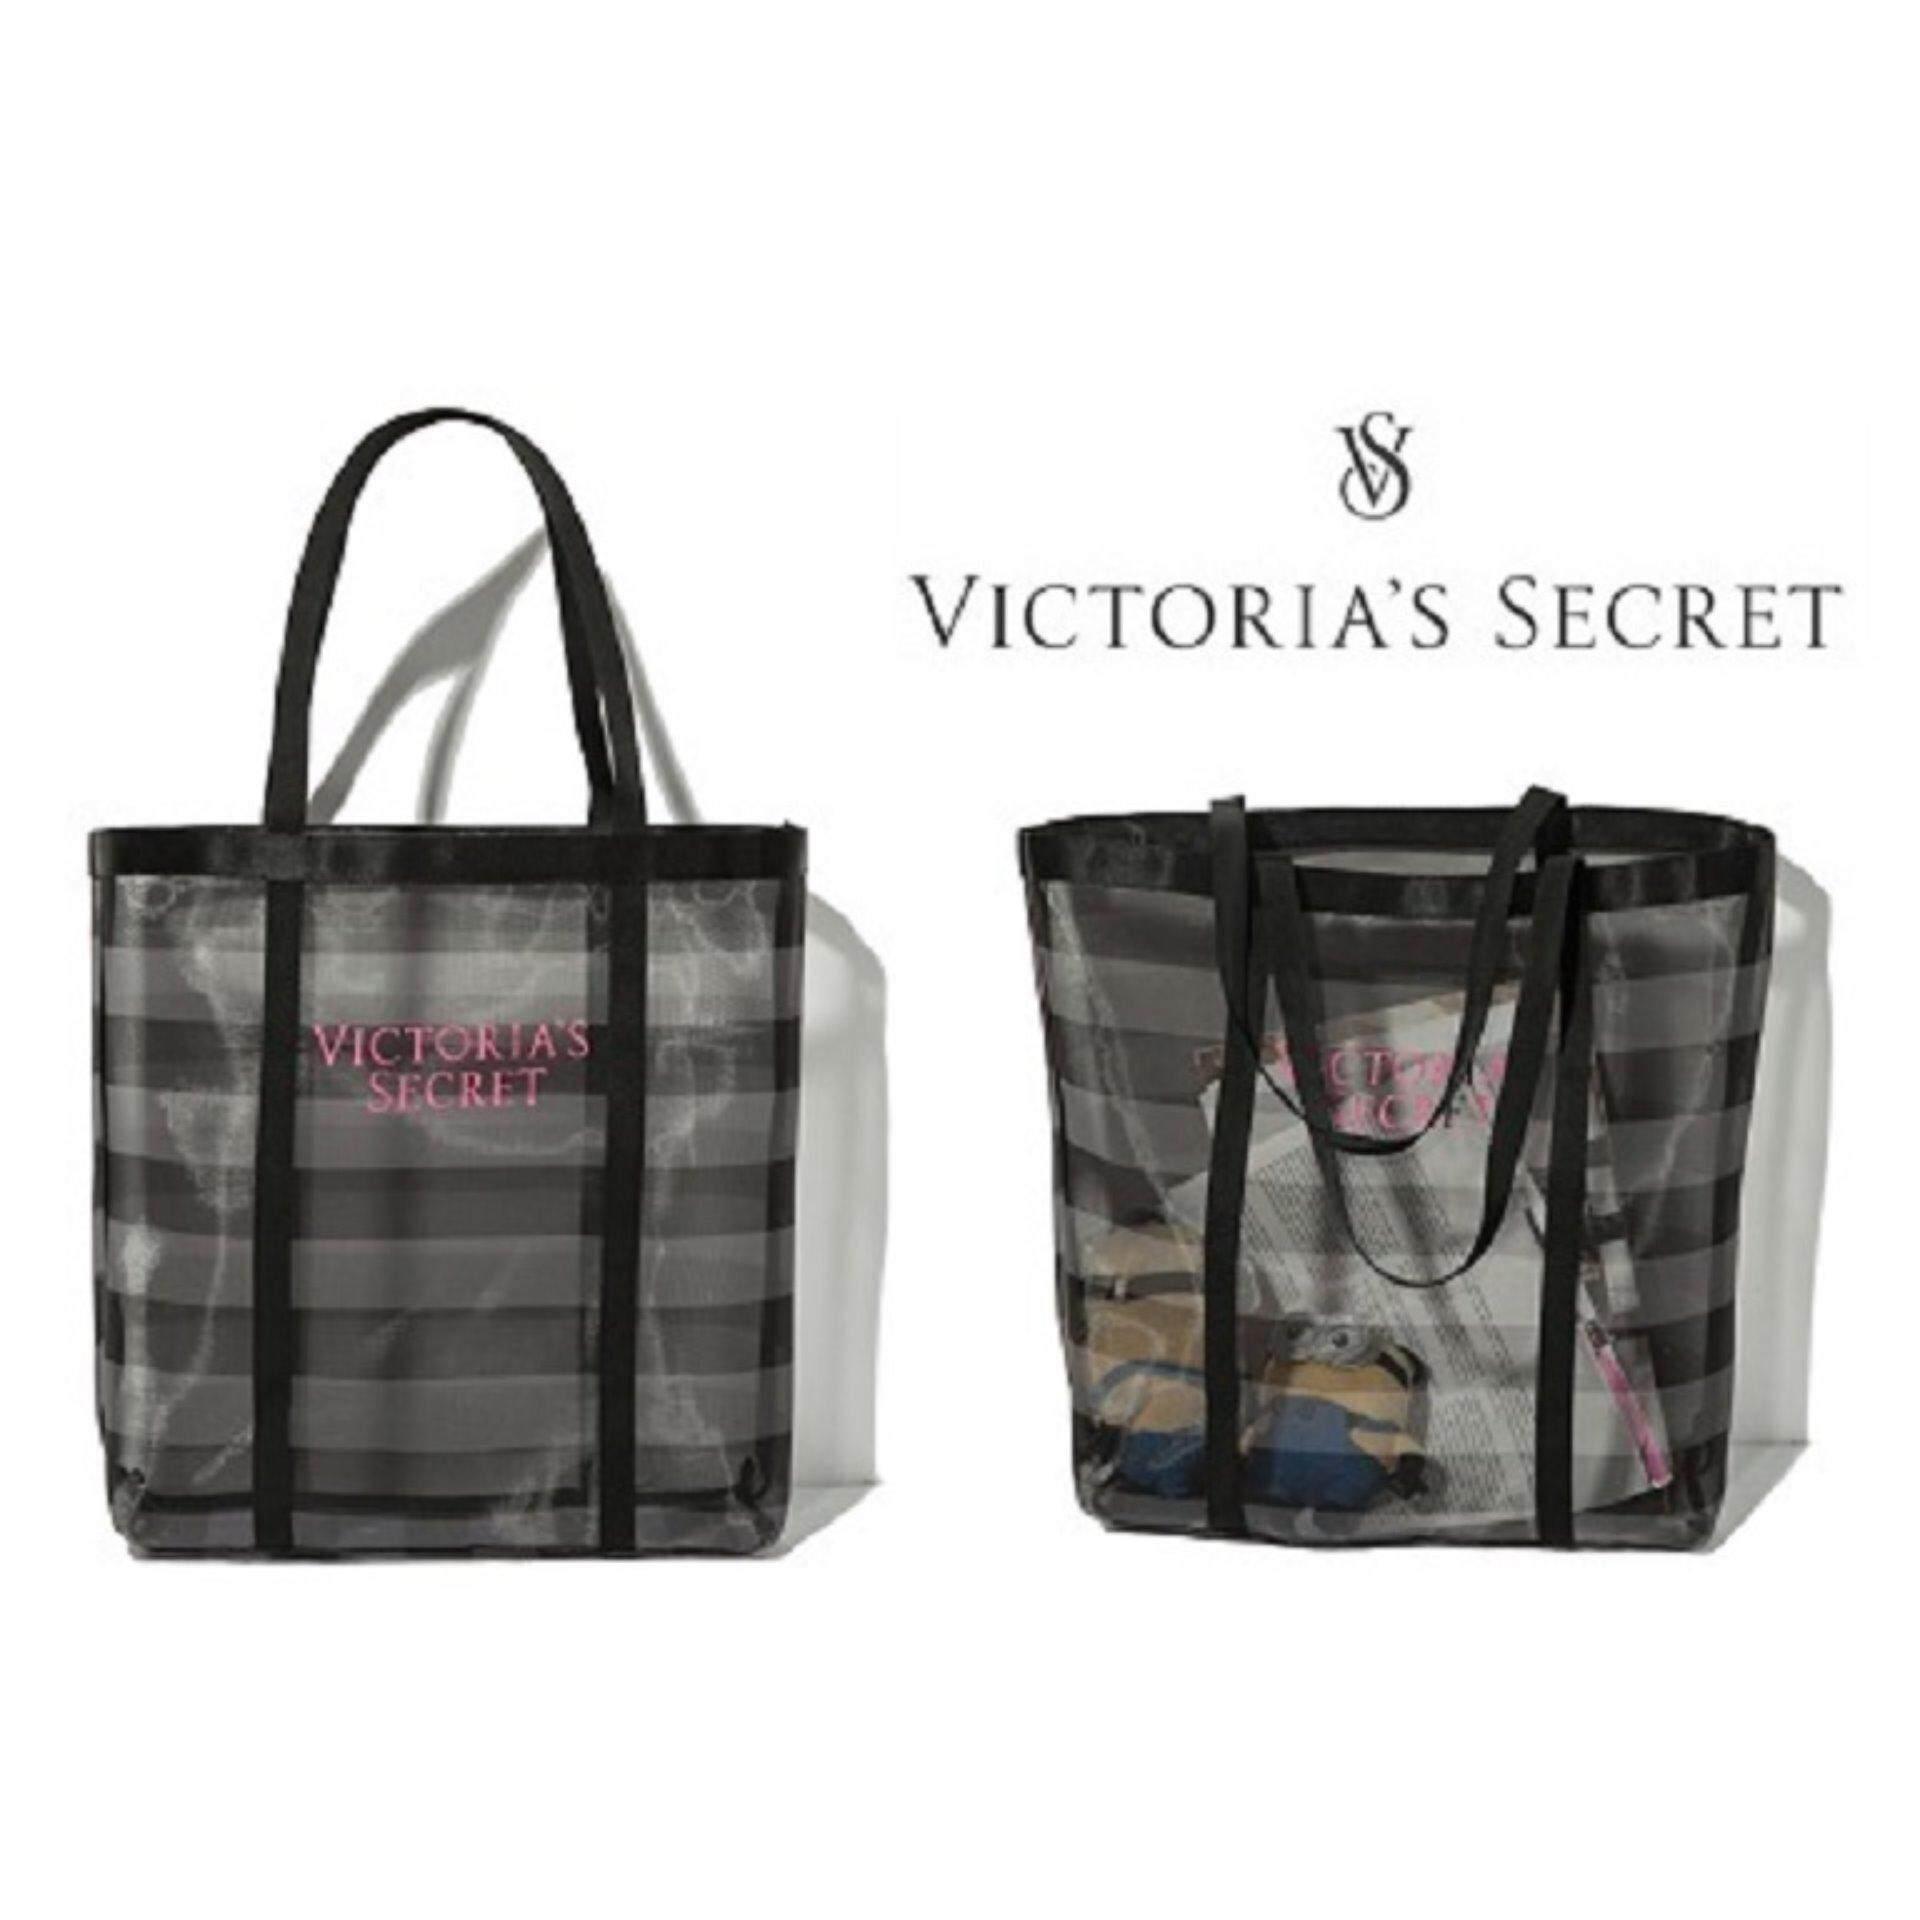 94b0cf5af8c07 Authentic RARE VICTORIA\'S SECRET Mesh Tote Bag